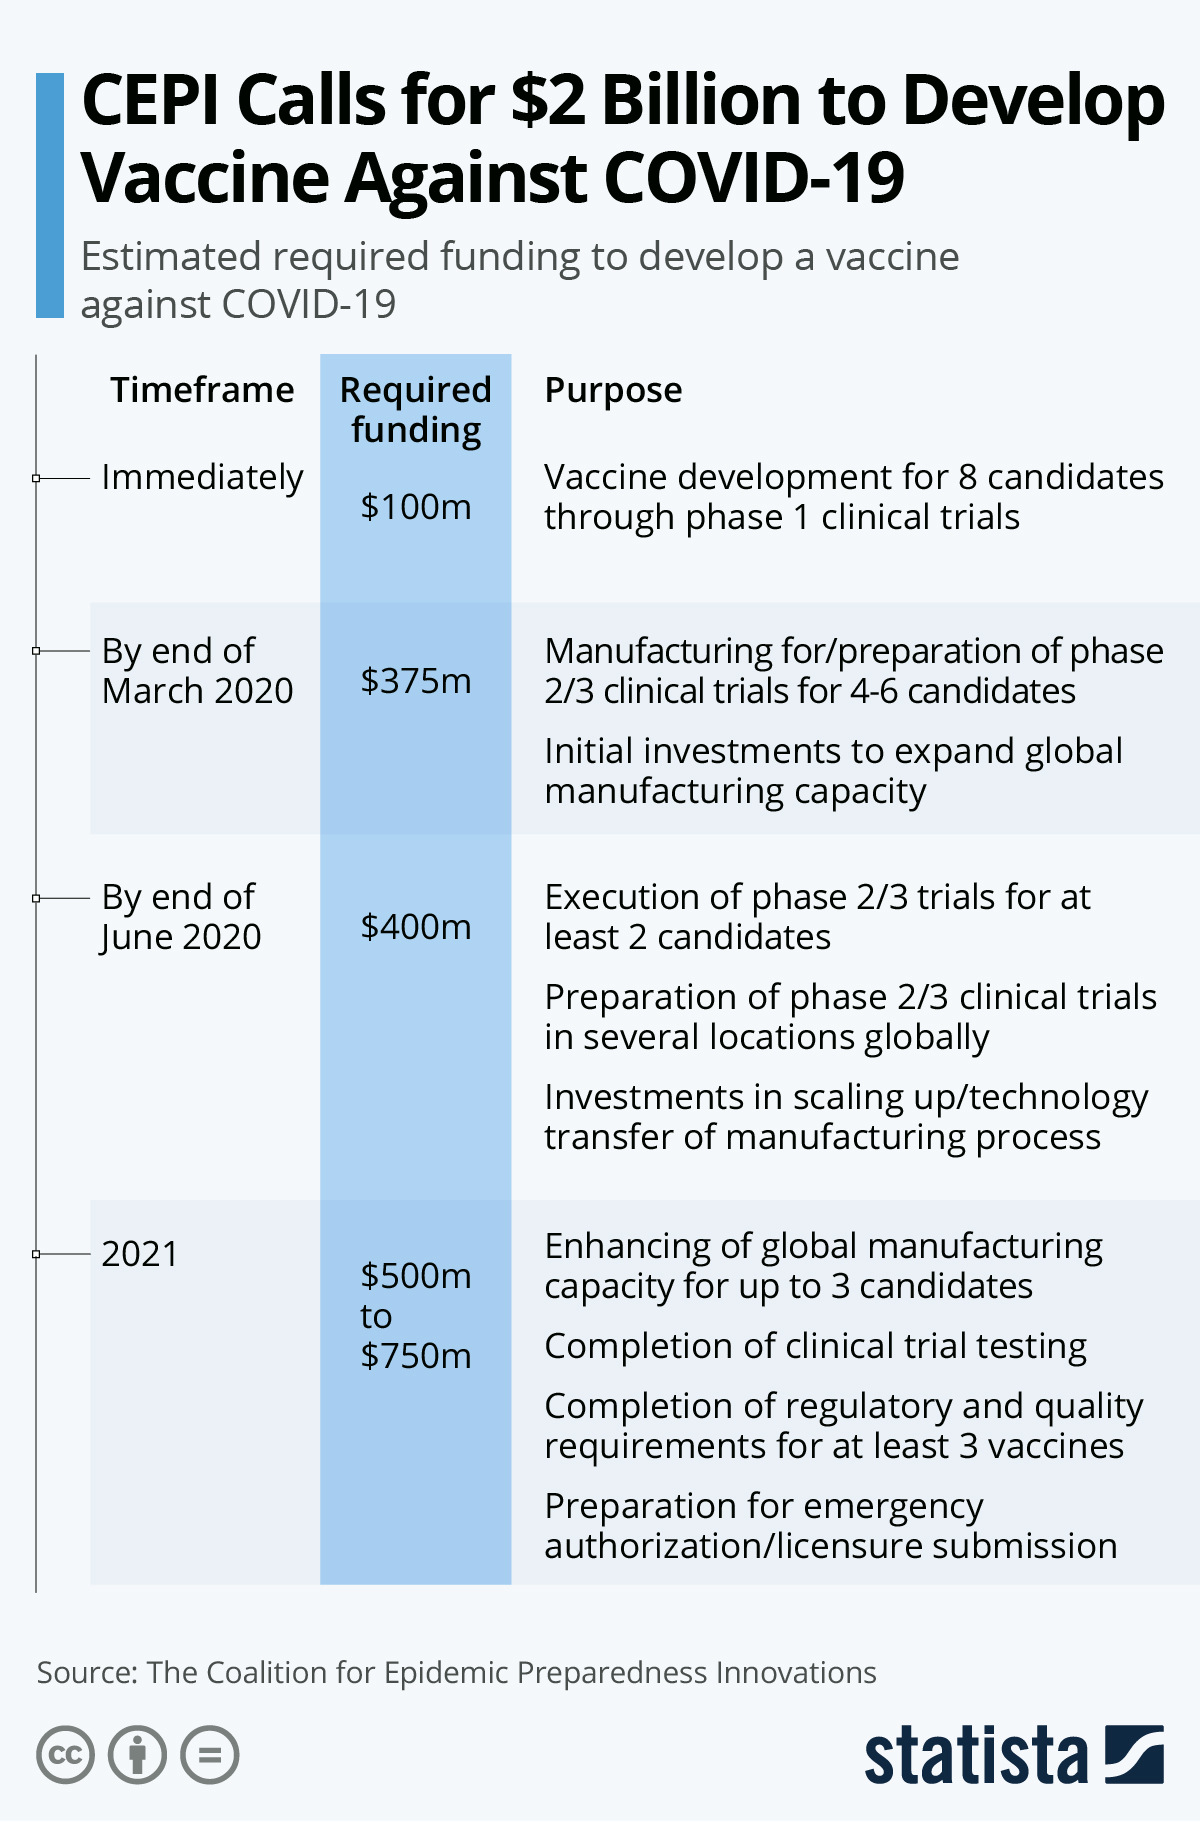 Infographic: CEPI Calls for $2 Billion to Develop a Vaccine Against COVID-19 | Statista